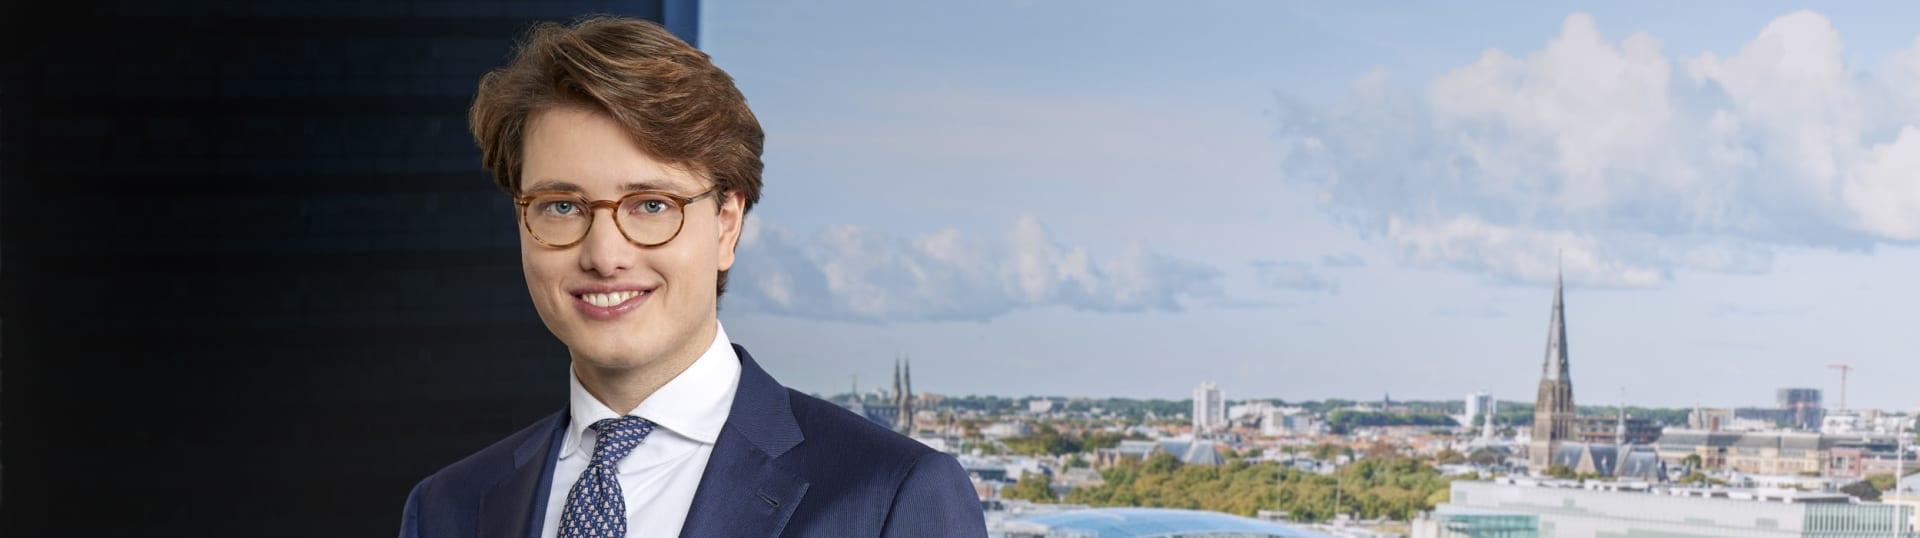 Paul Tanja, advocaat Pels Rijcken